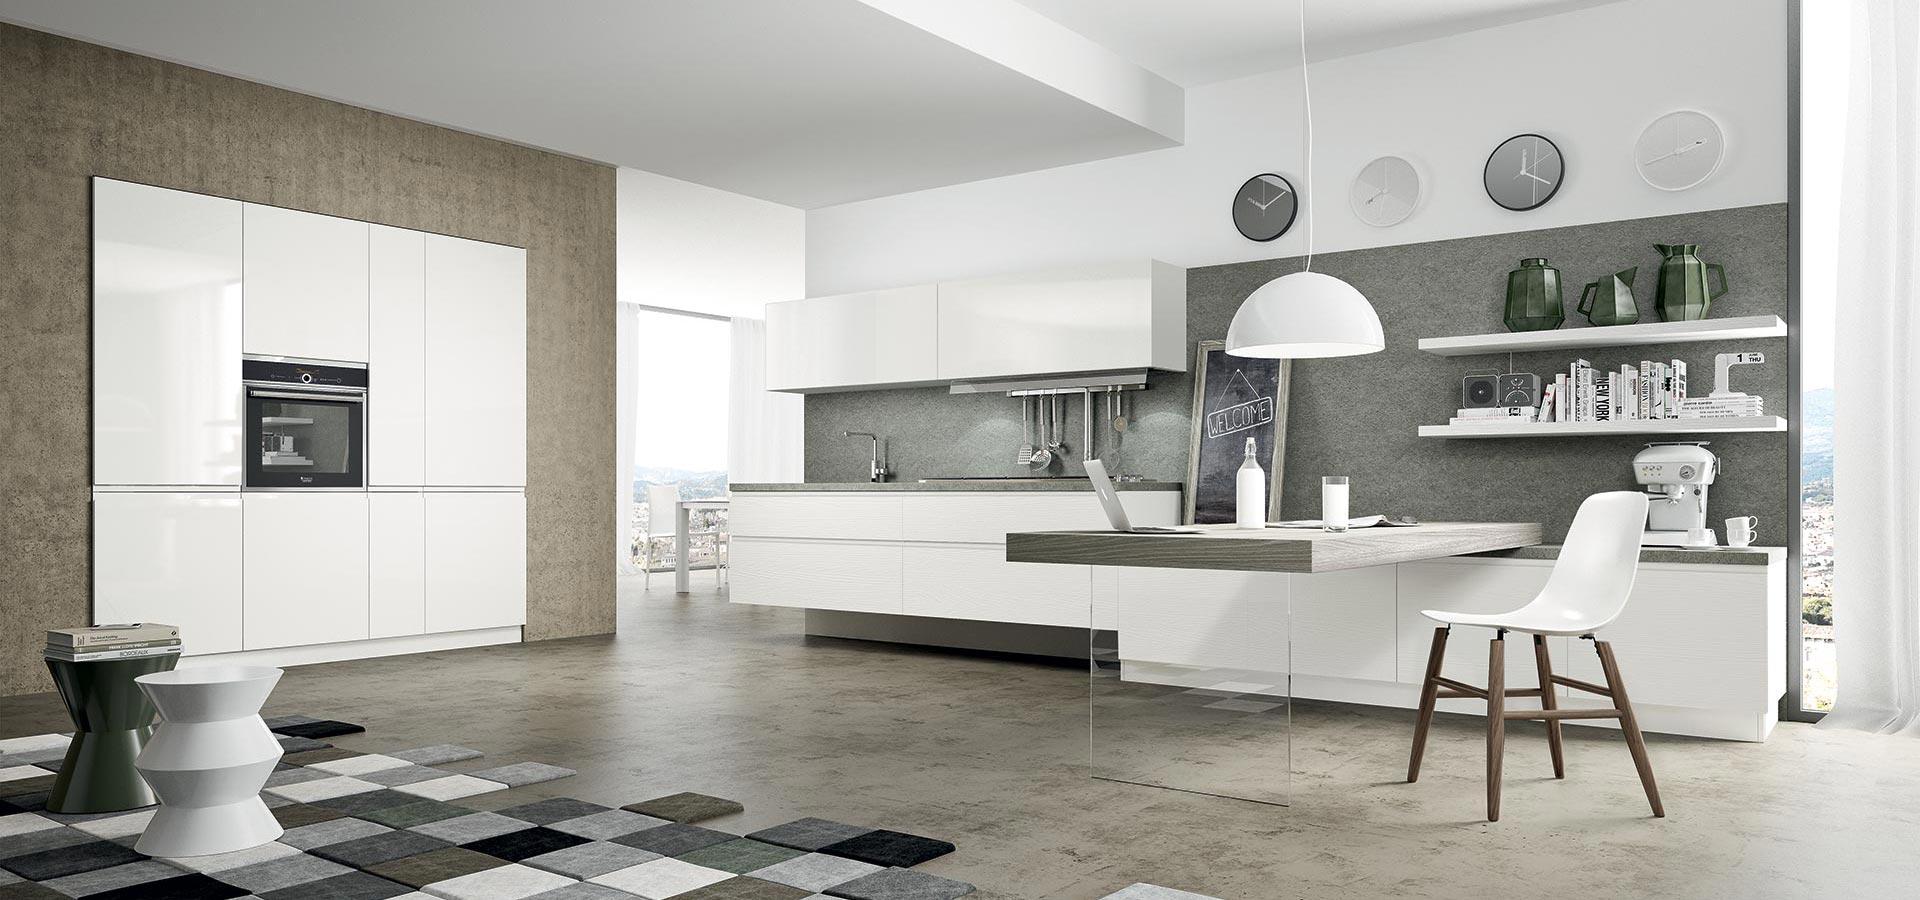 Arredamenti Gallomobili Mobili Udine - Cucine Moderne - Cucina Wega